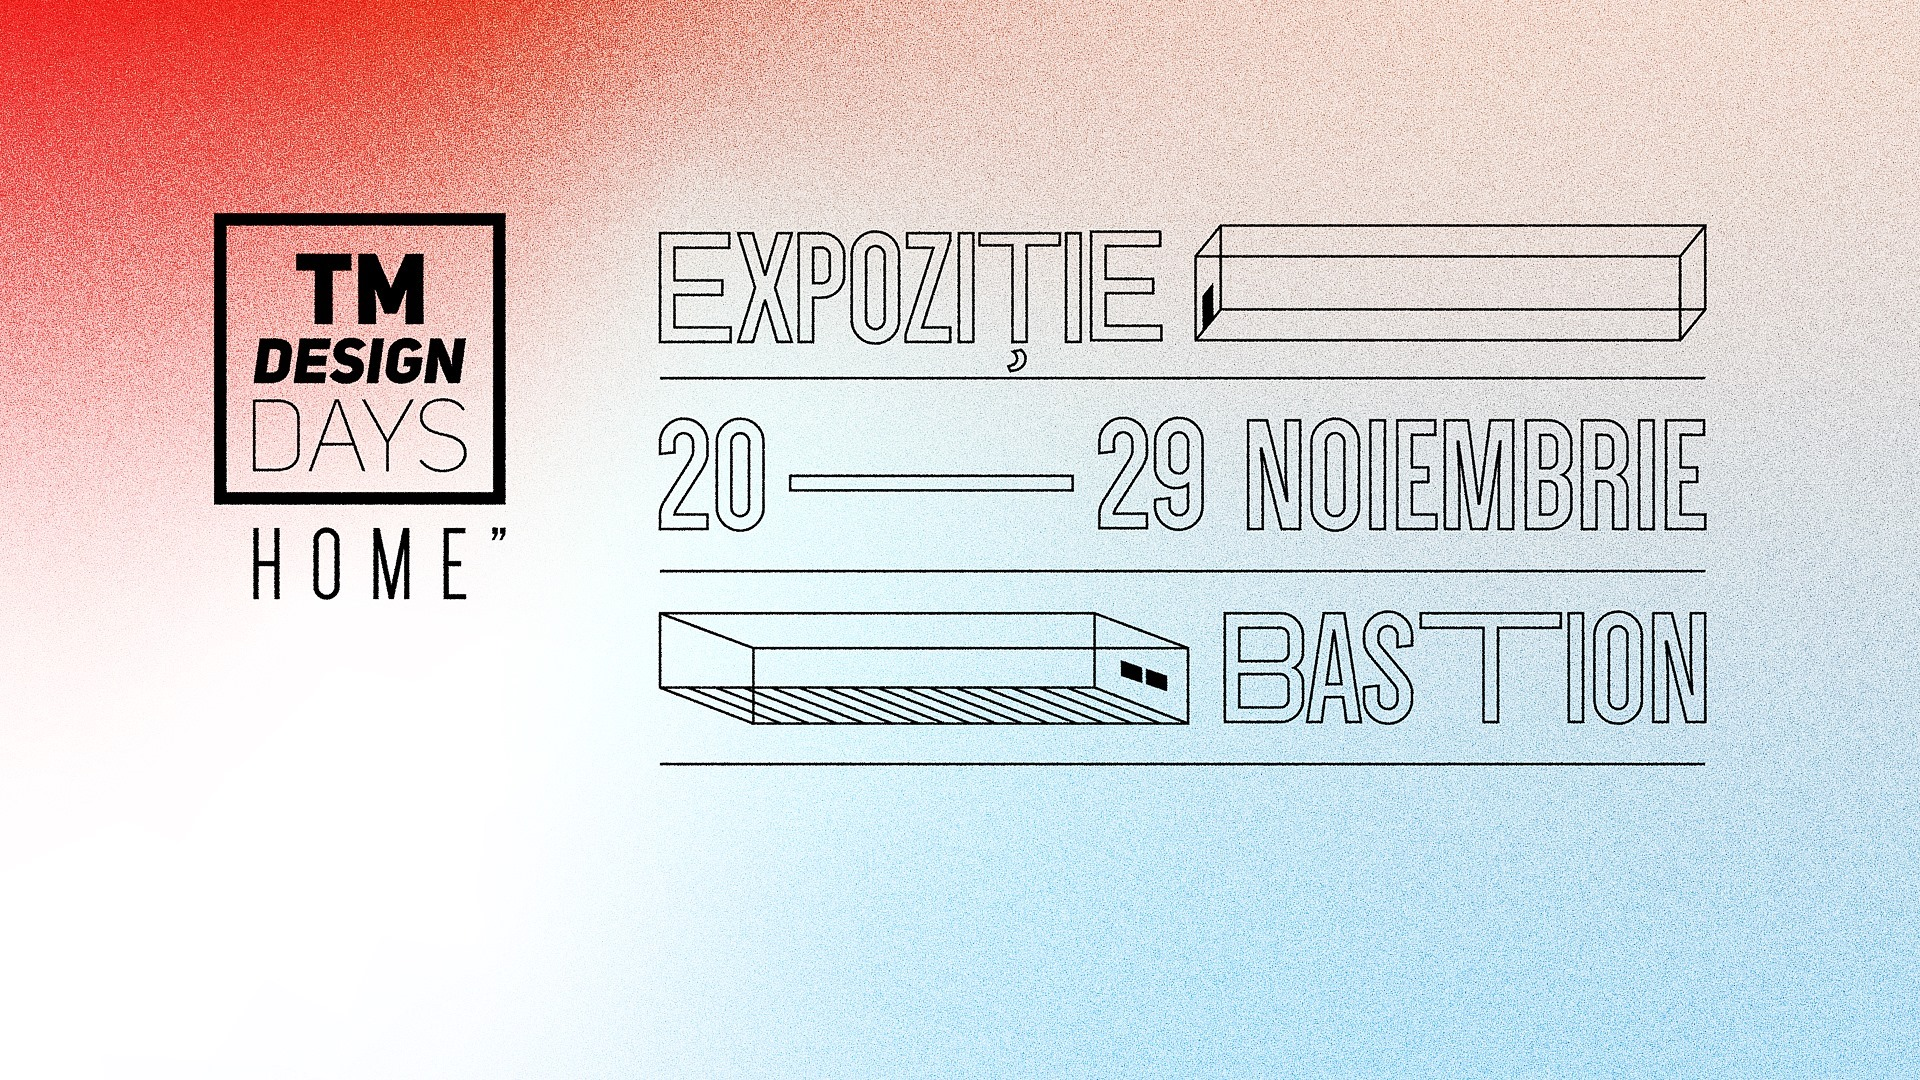 Timișoara Design Days / HOME exhibition